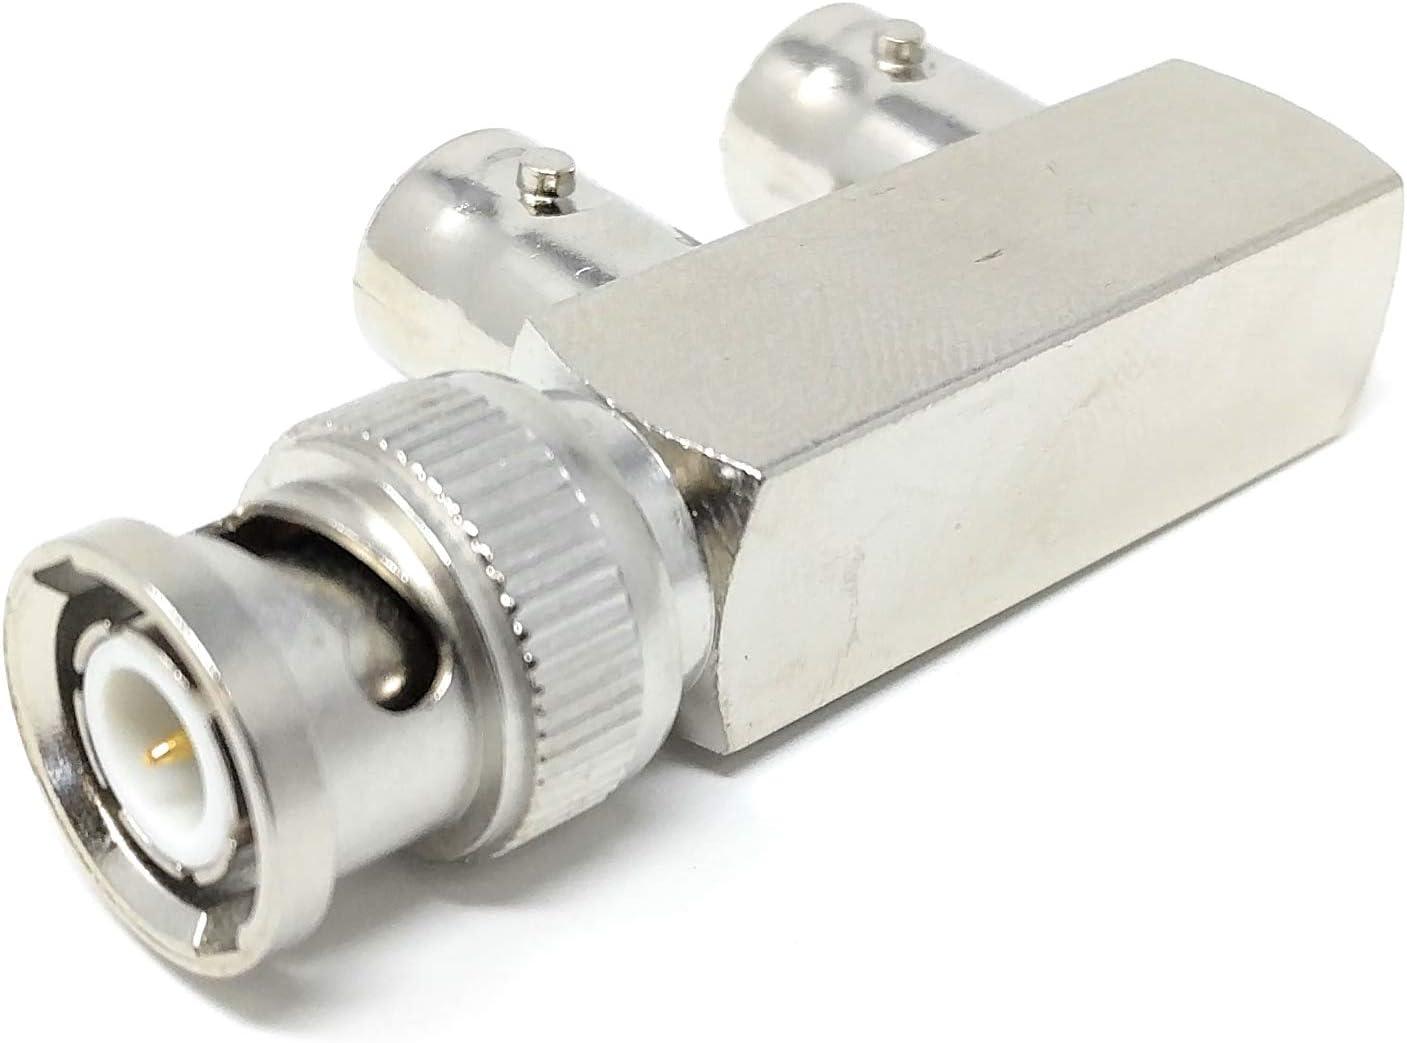 5x T-BNC Coaxial Connector Splitter Adapter 2x Female 1x Male VIDEO TBNC